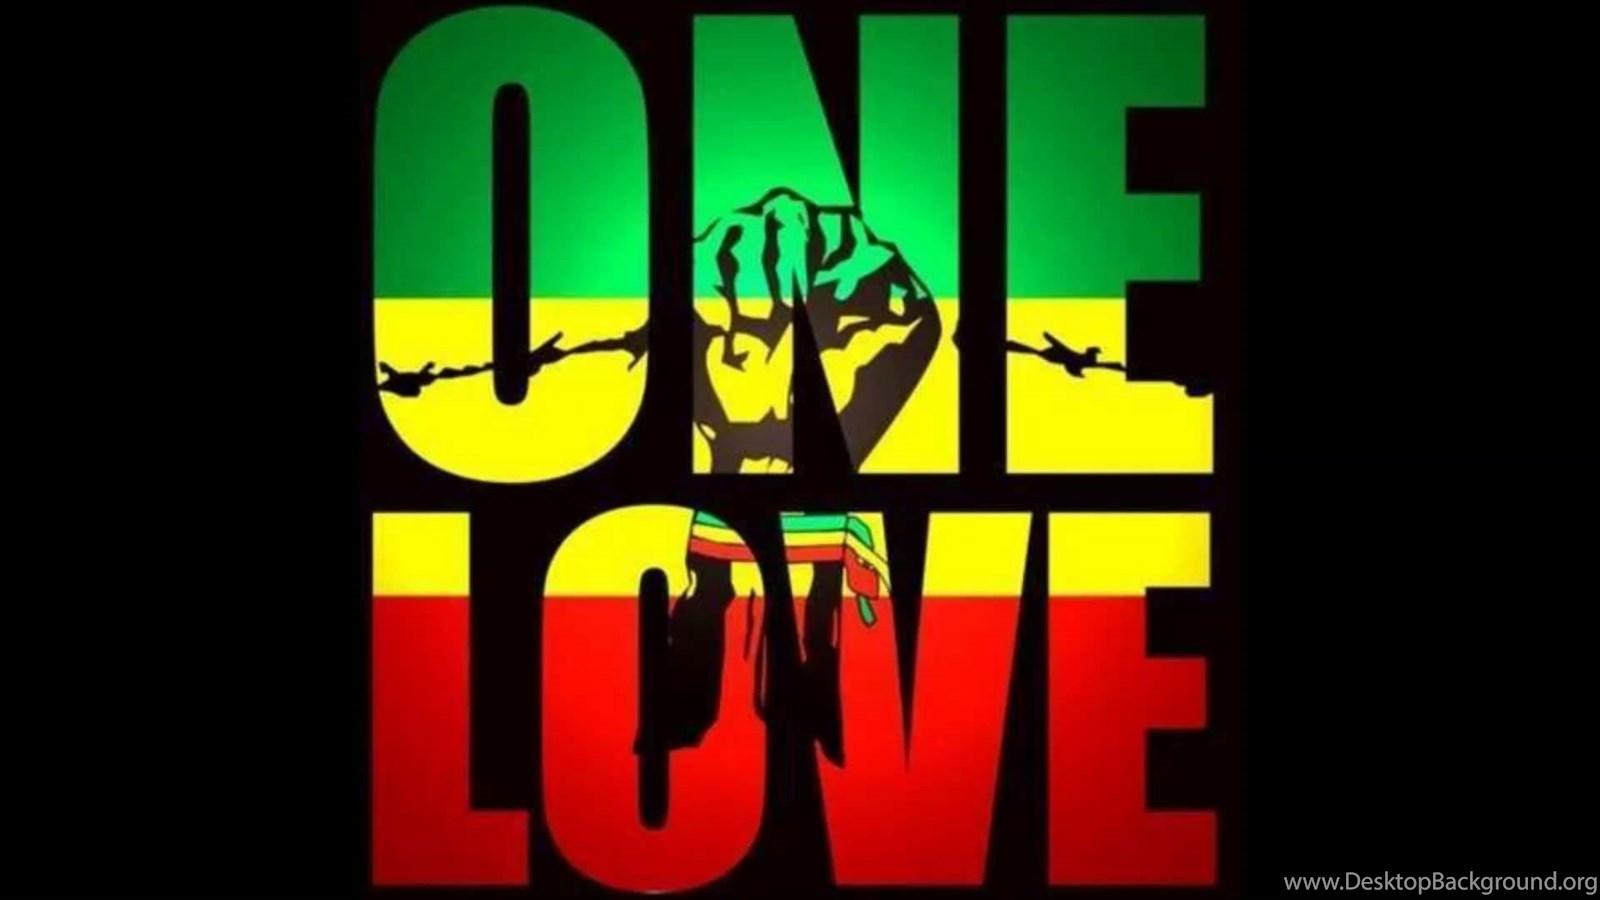 Love hip hop instrumentals free download